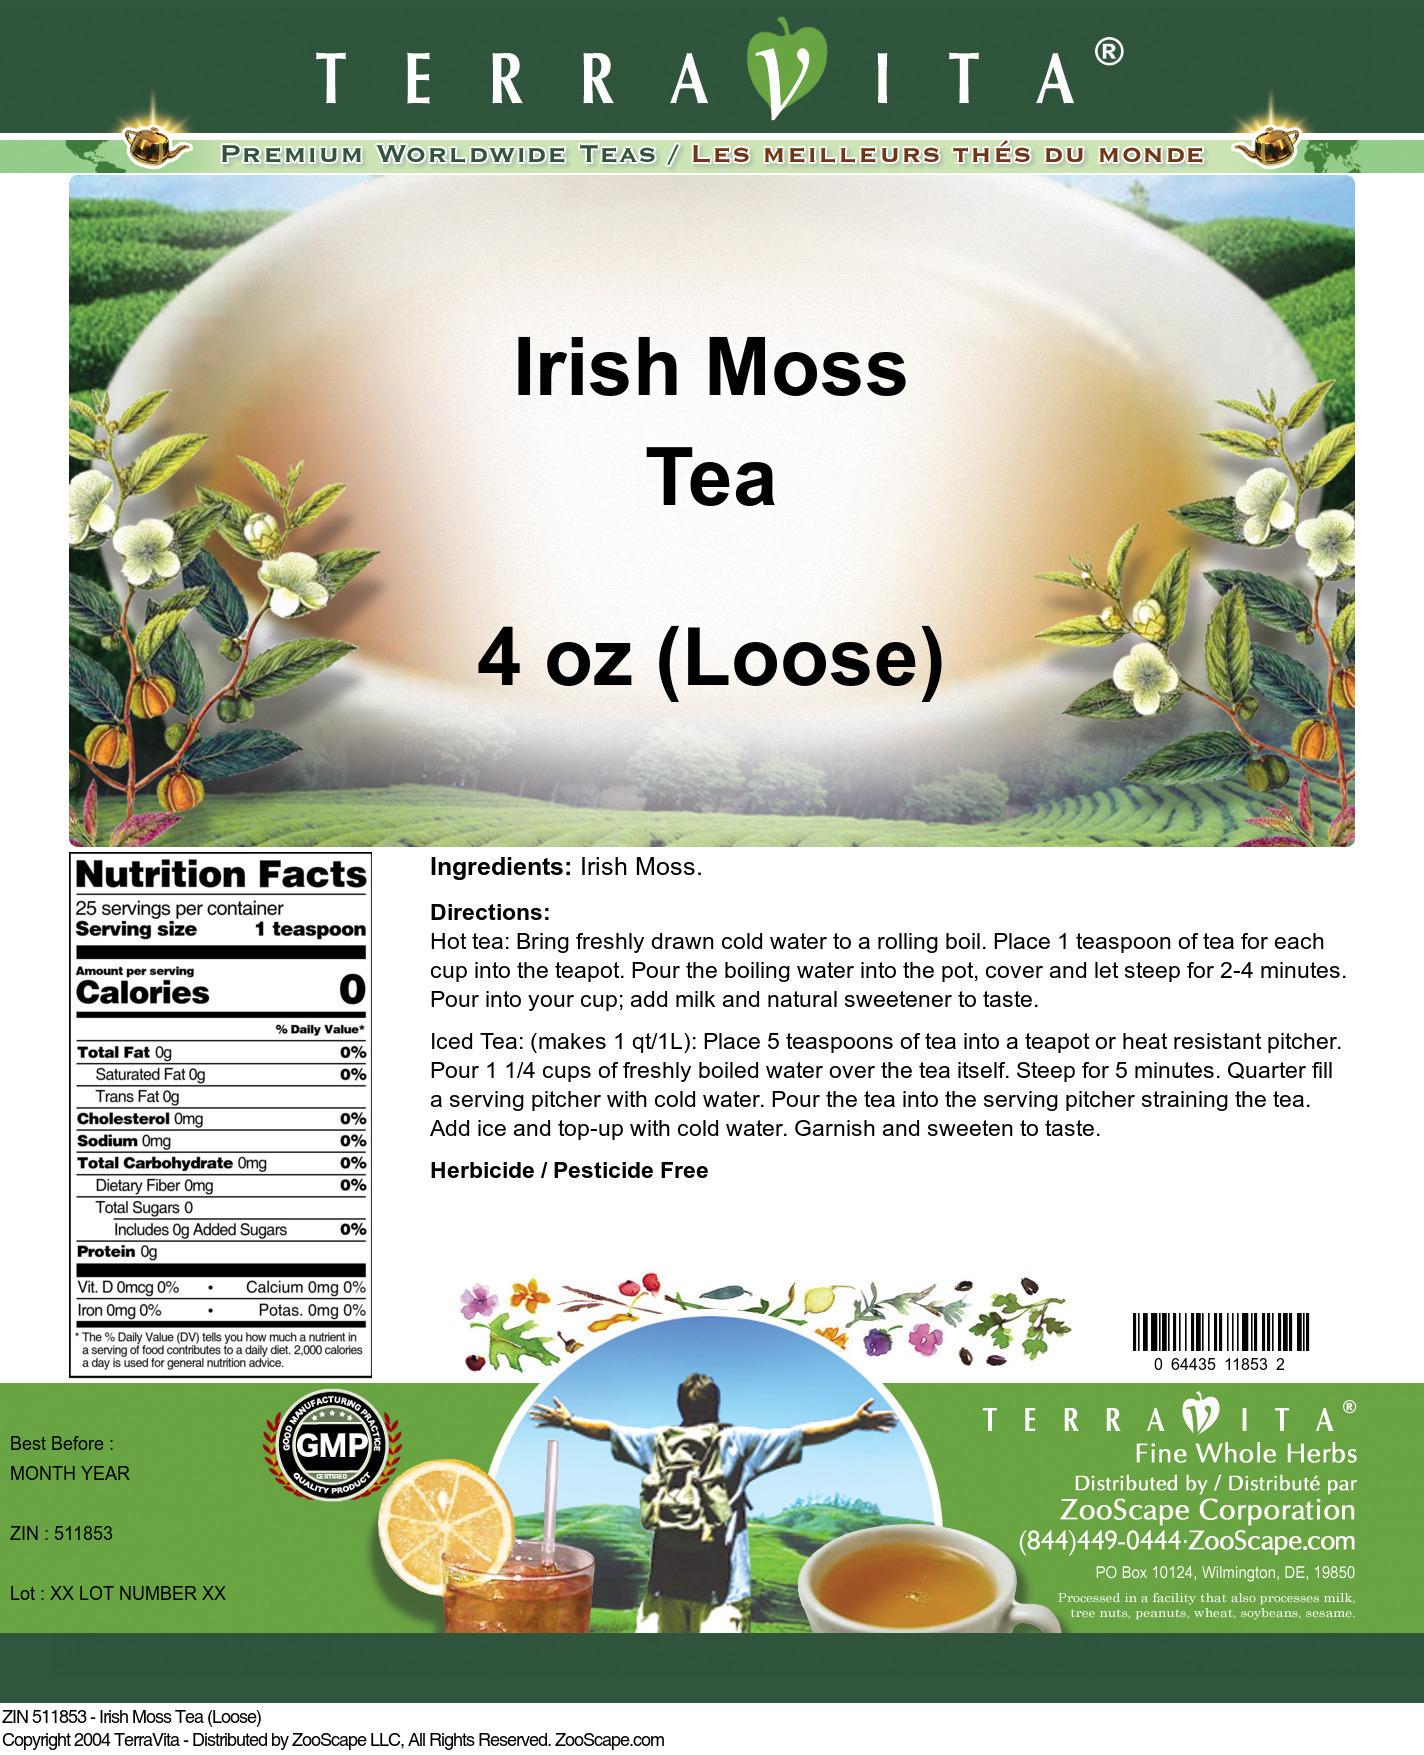 Irish Moss Tea (Loose)